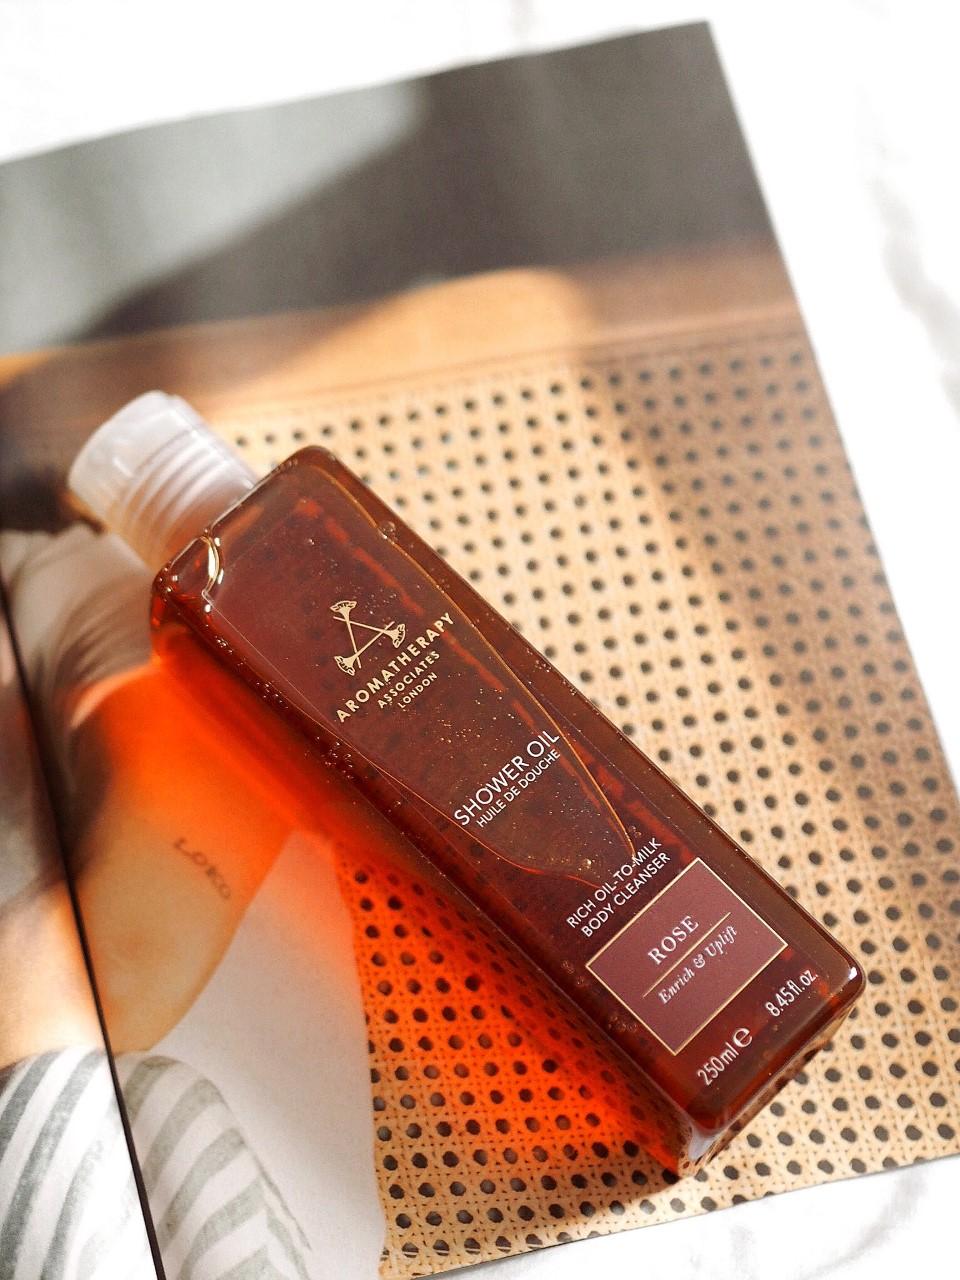 Aromatherapy Associates Shower Oil